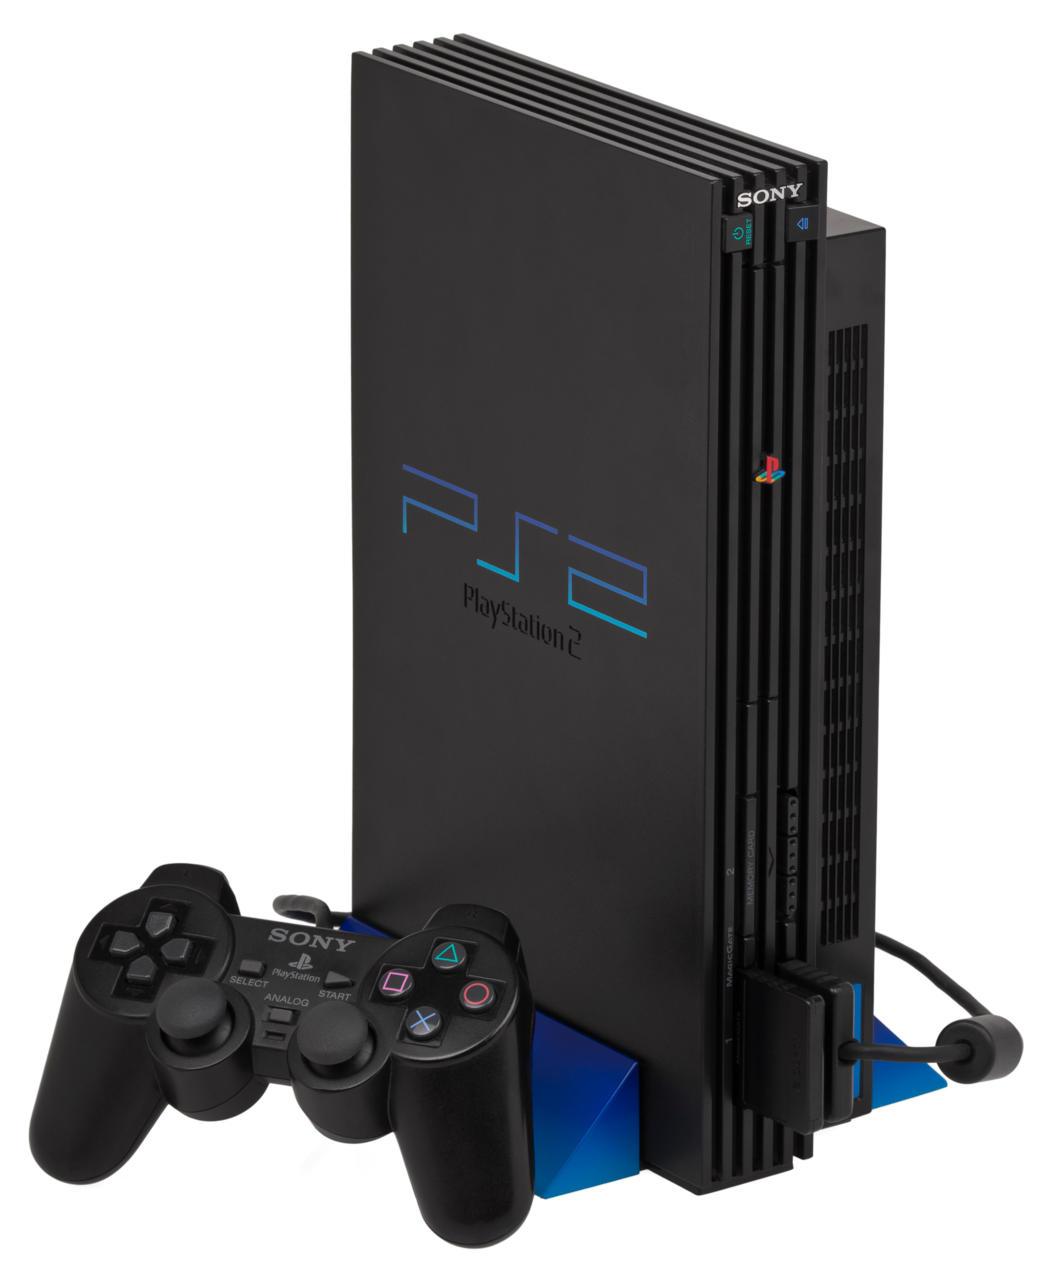 1. PlayStation 2